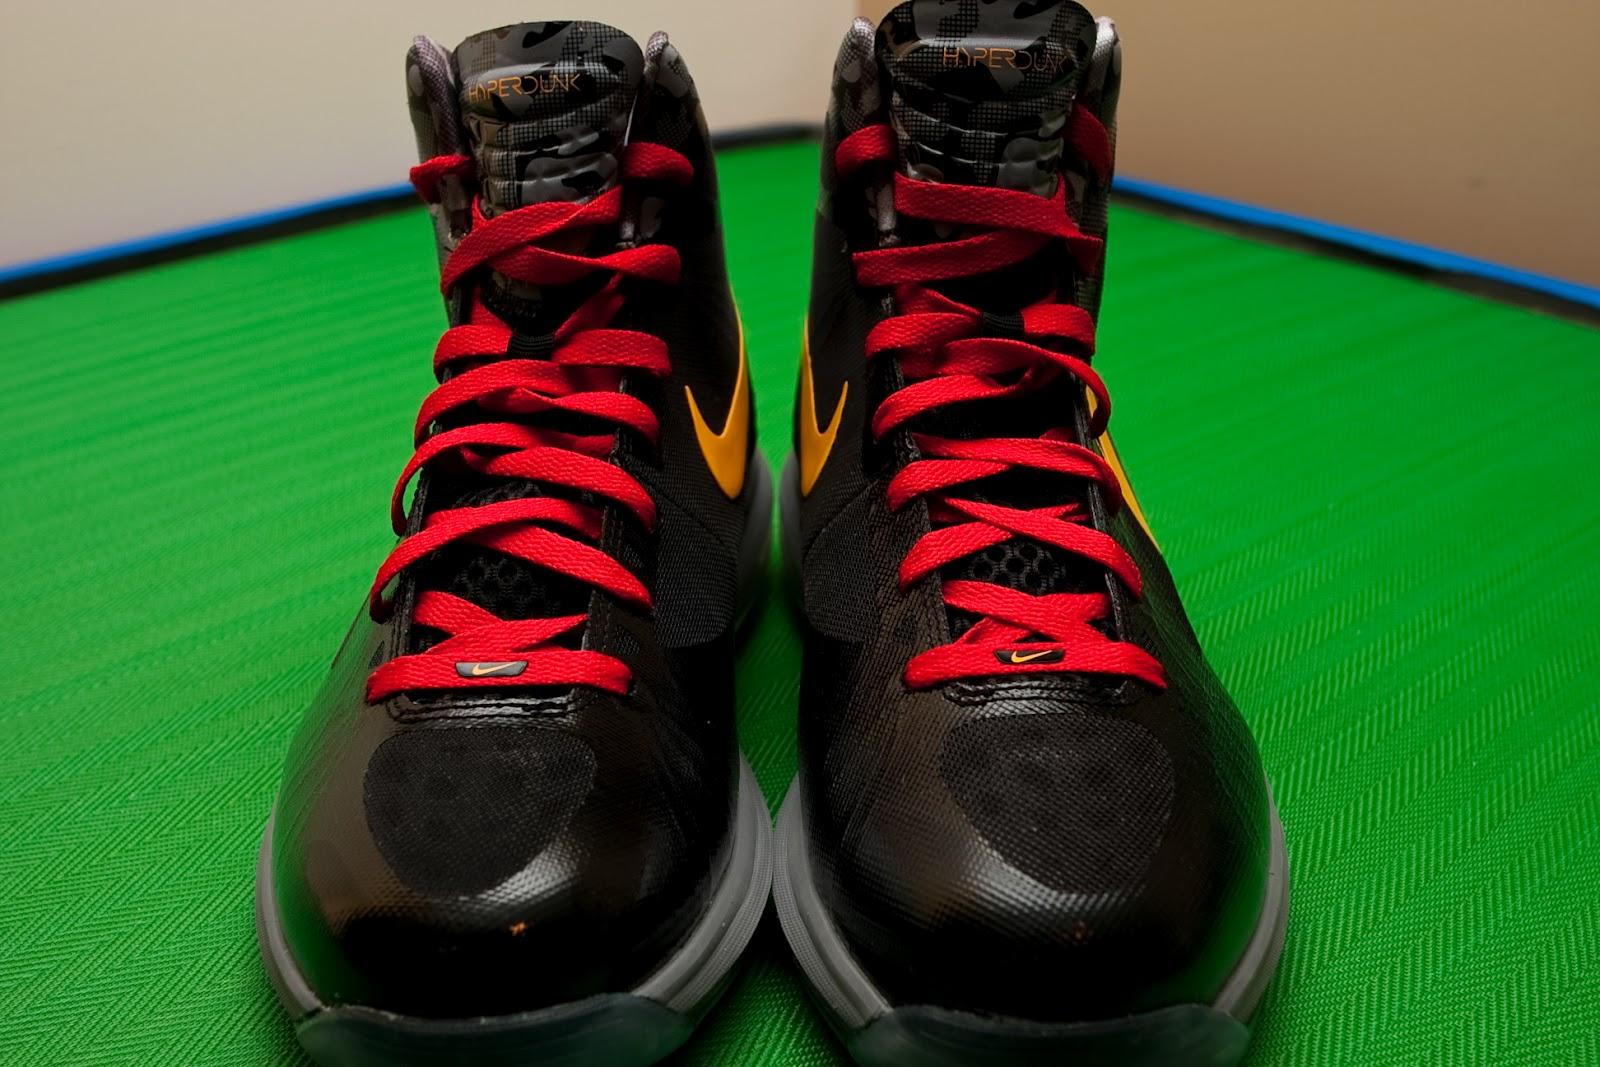 Air Max Hyperdunk 2011 - Chris Bosh - Teaser Joel Anthony wearing Nike ... 5141f024bb